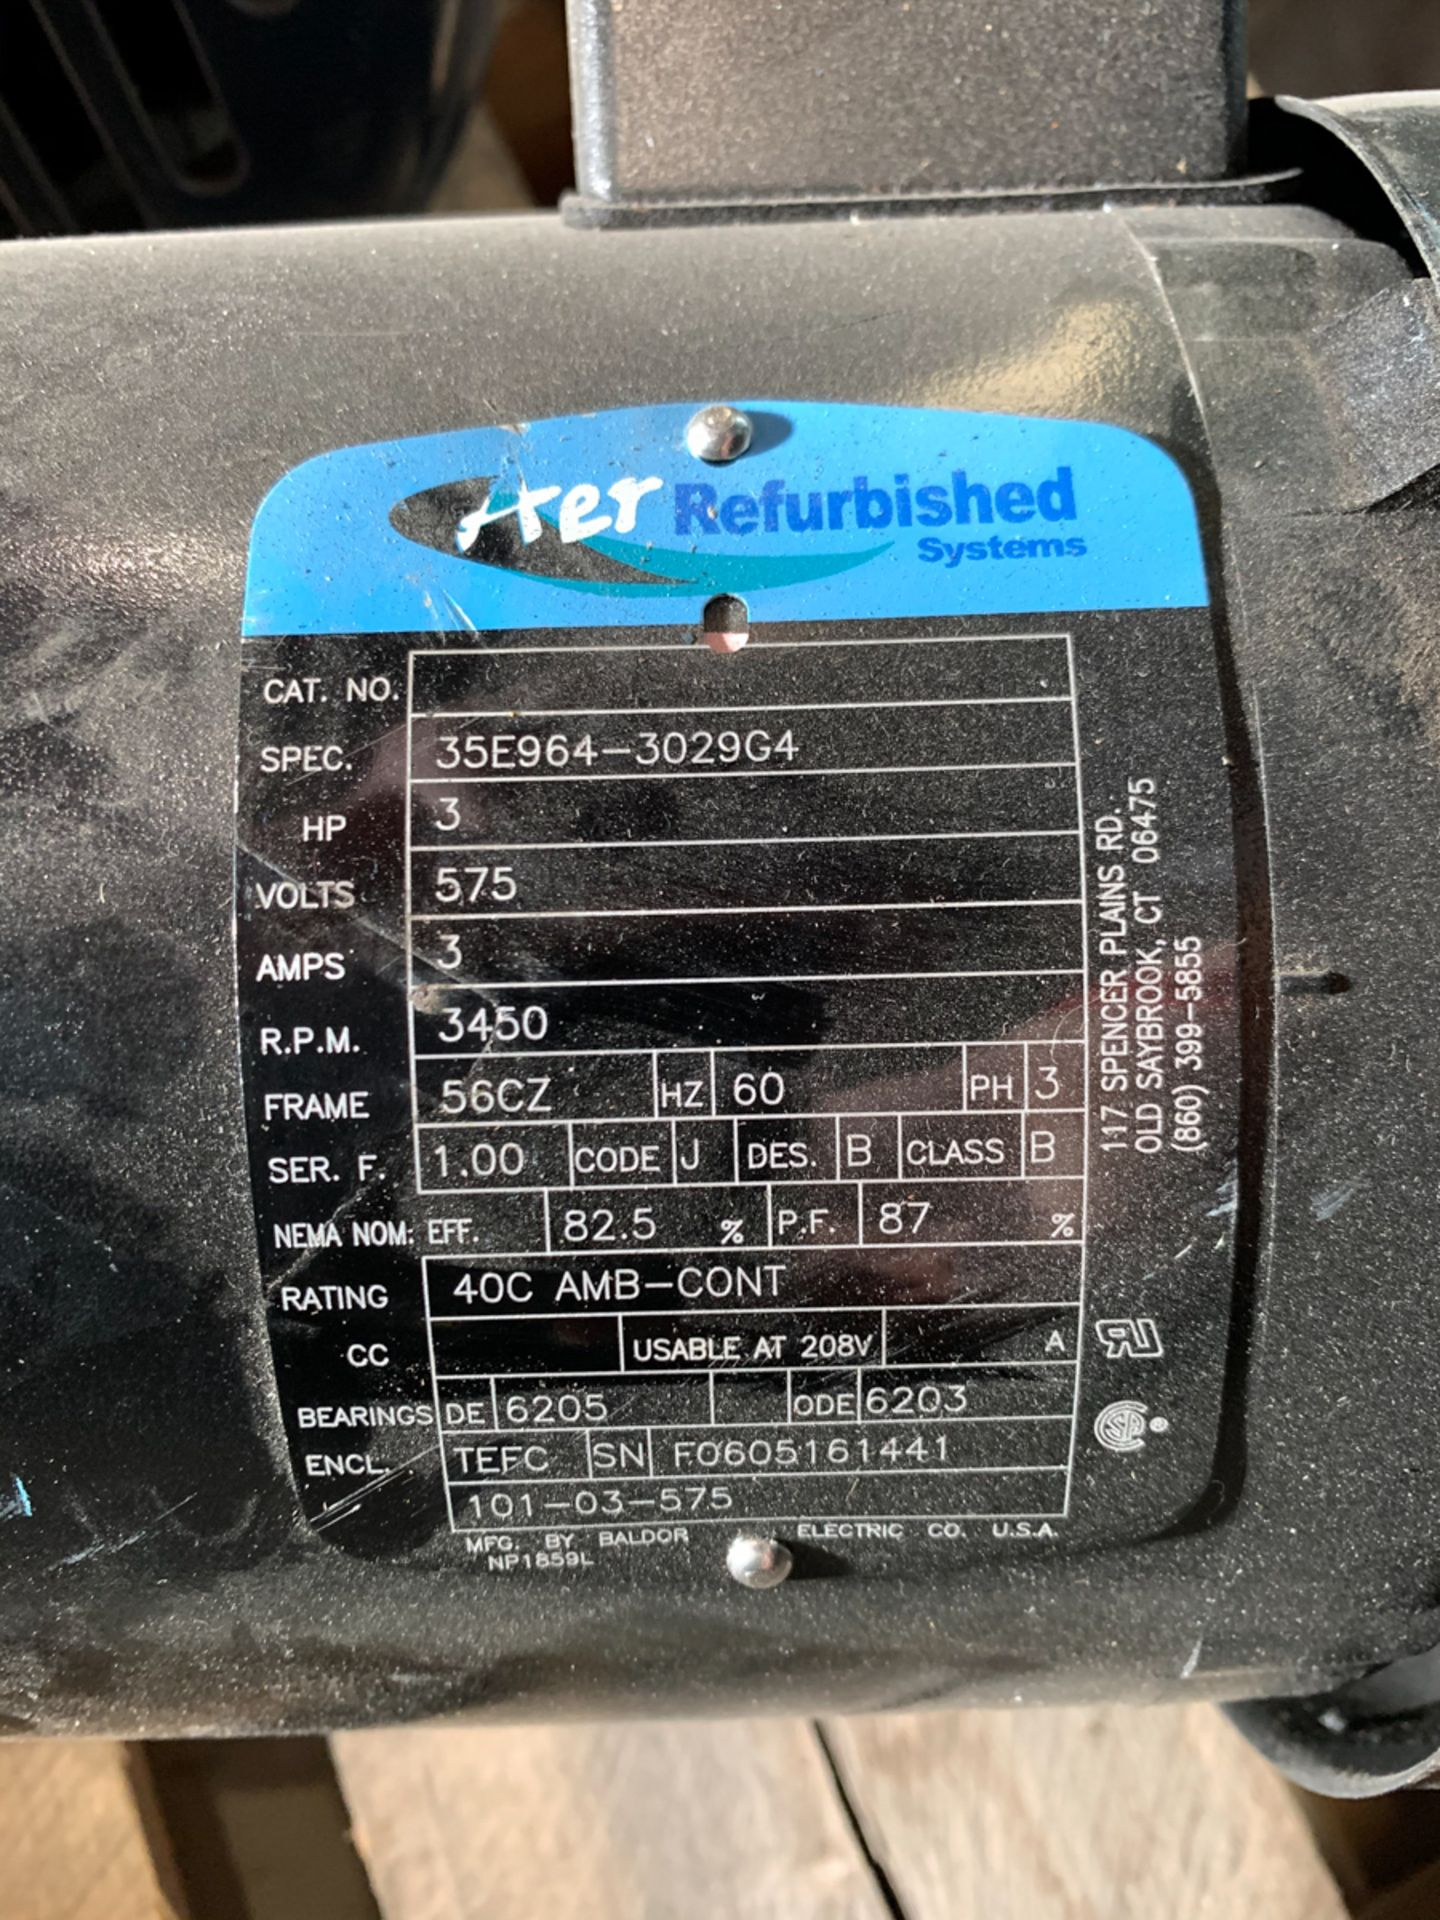 AER 3 HP MOTOR, 575 VOLTS - Image 2 of 2